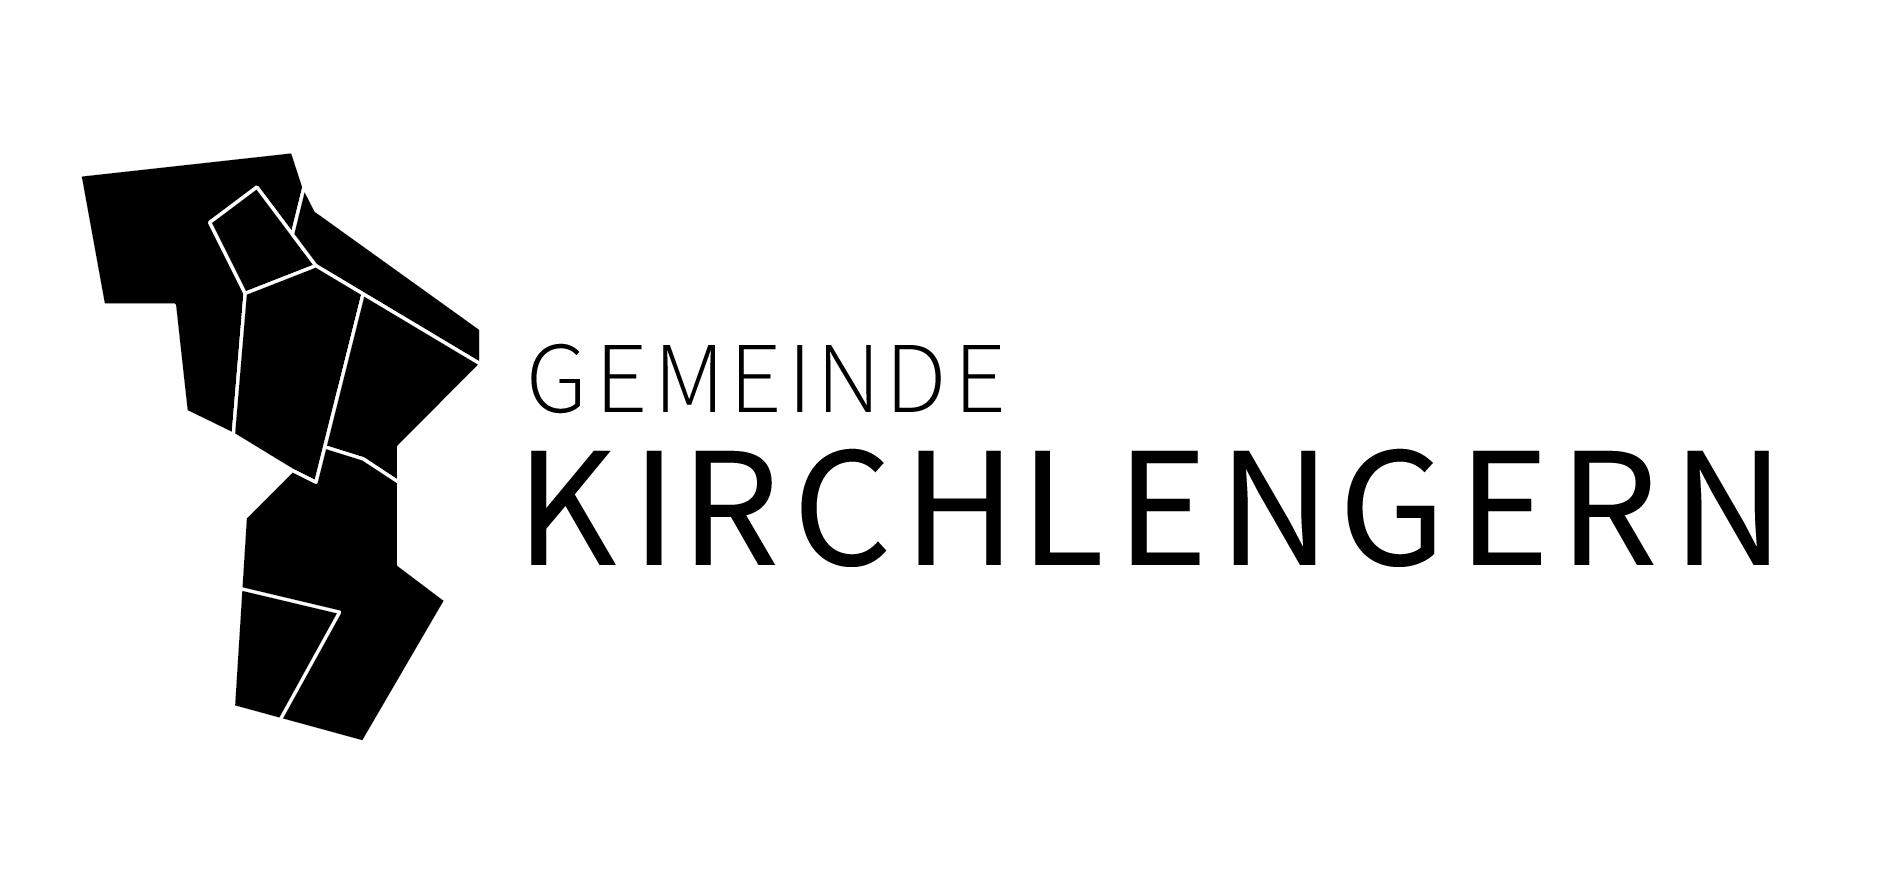 Kirchlengern_Logo_170316_1C_RZ